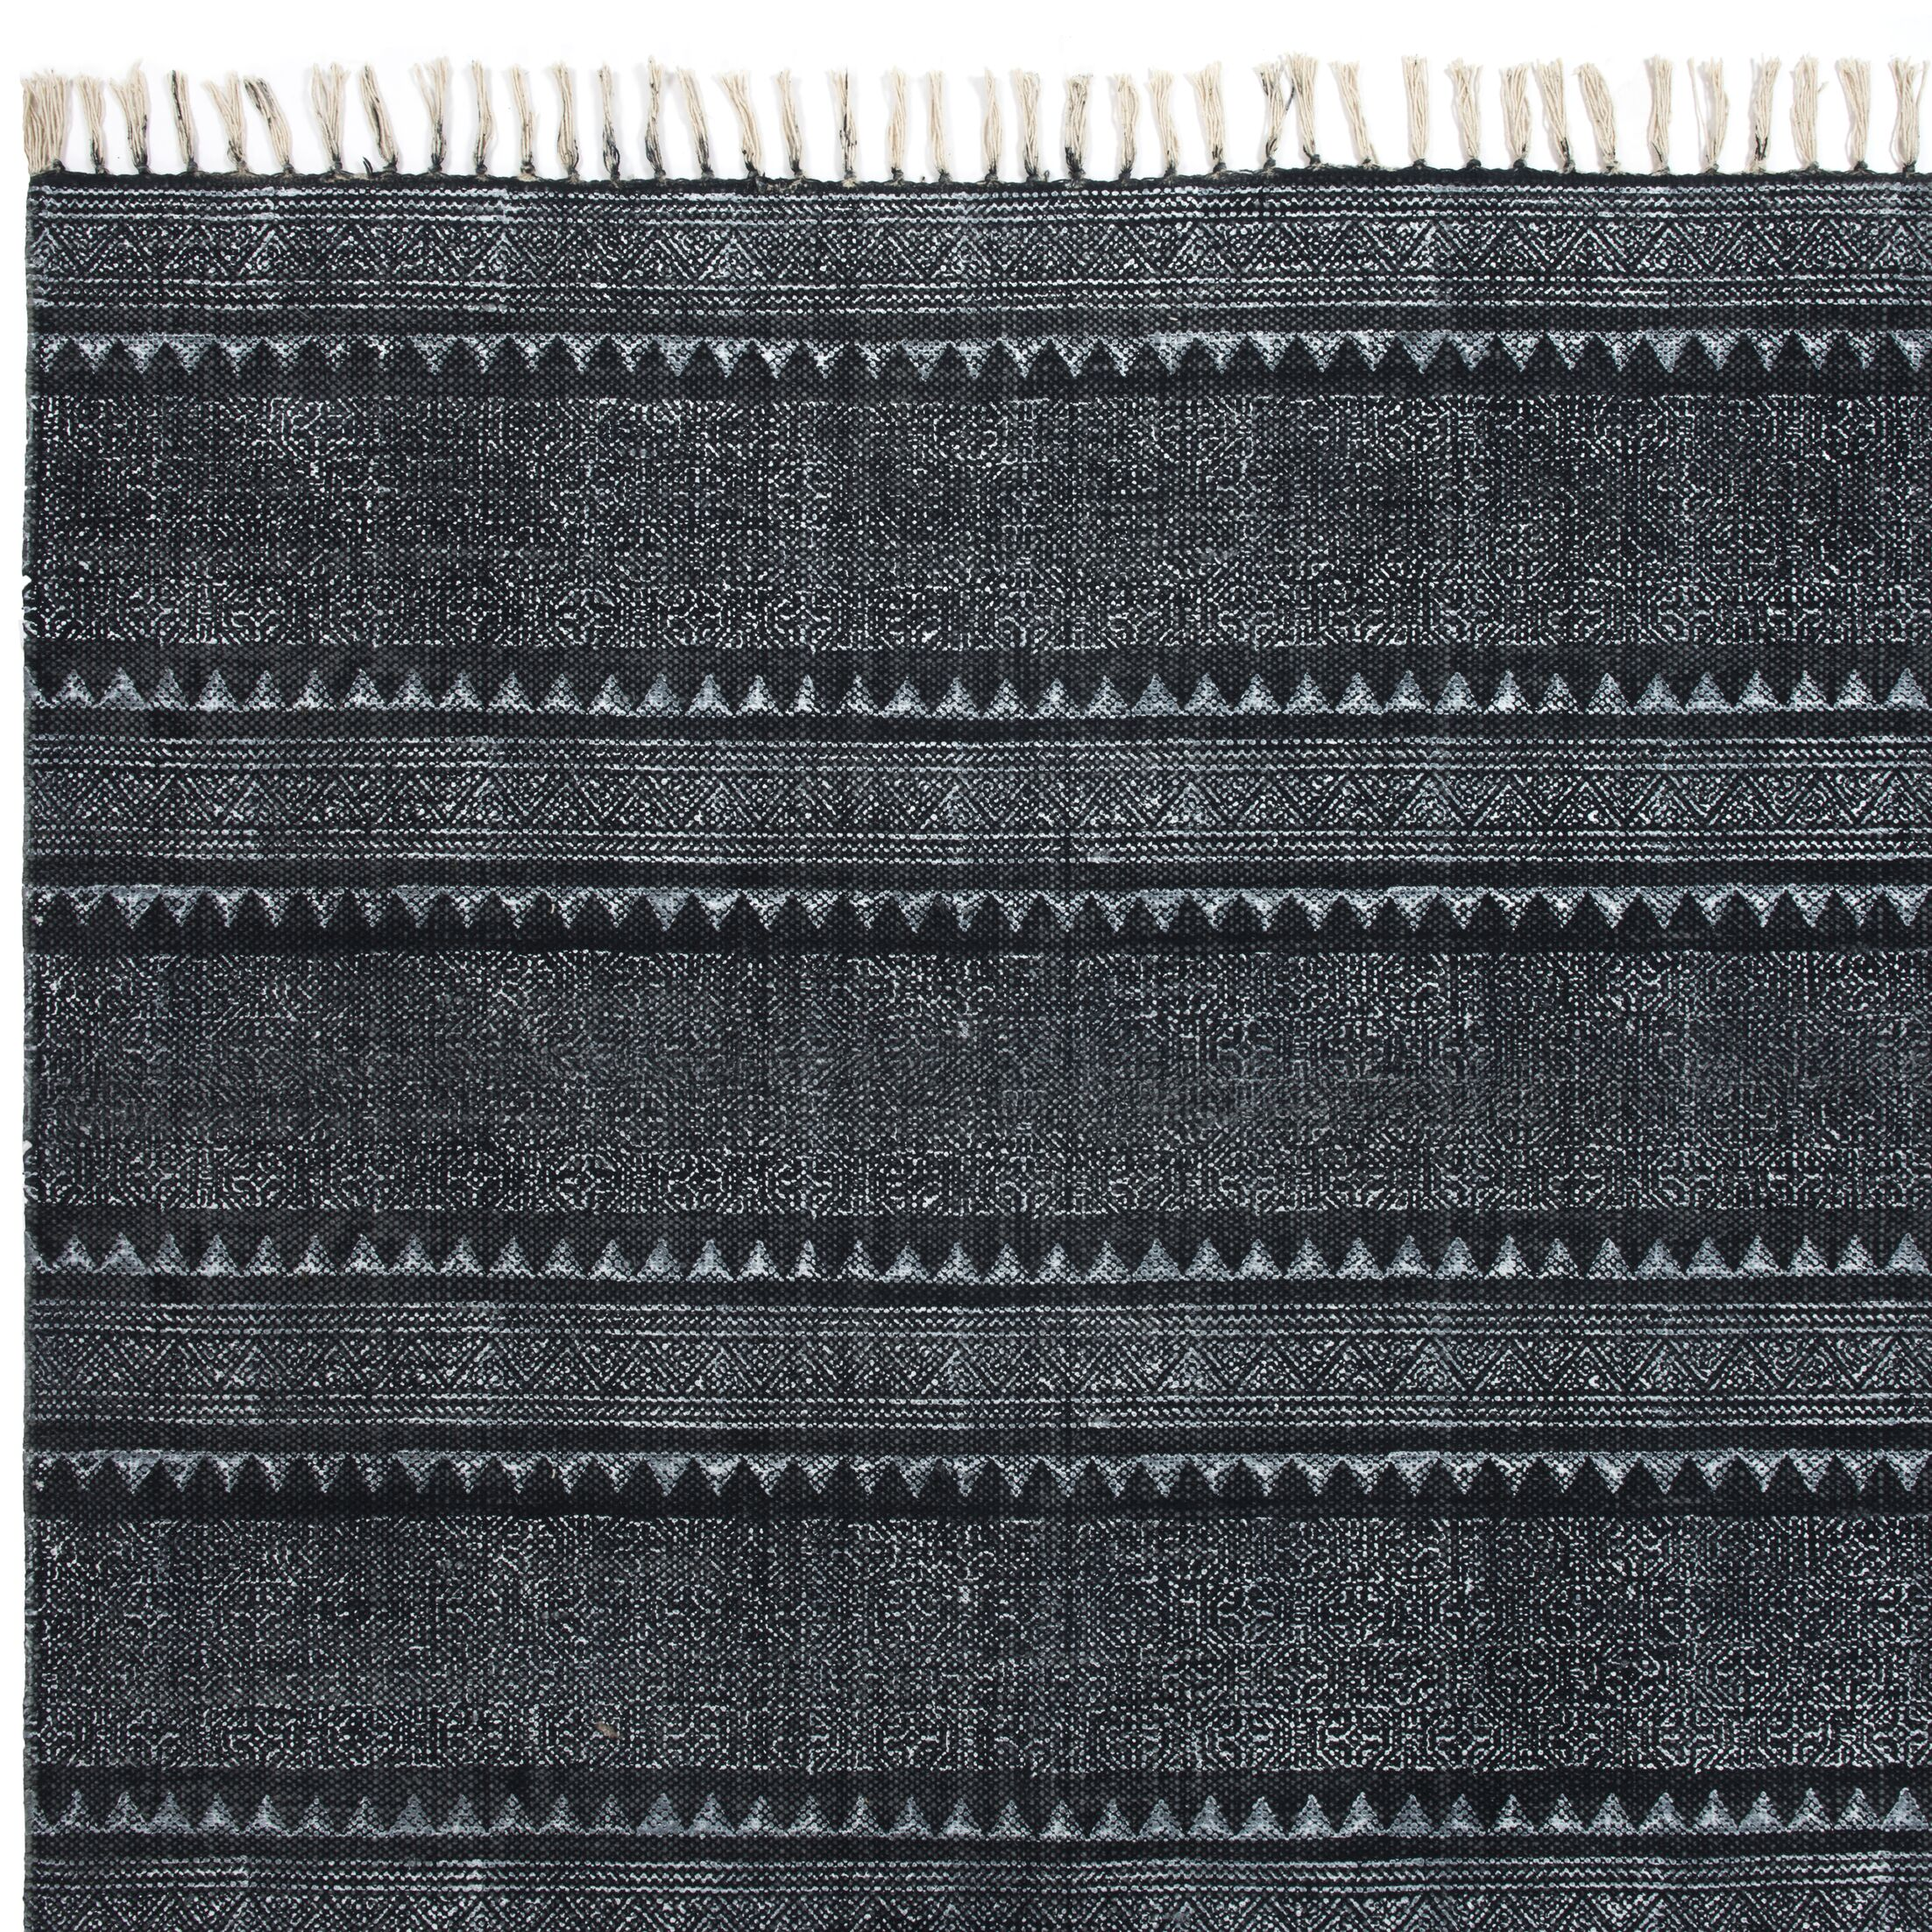 Astin Block Print Hand Woven Cotton Black/Denim Area Rug Rug Size: Rectangle 9' x 12'1